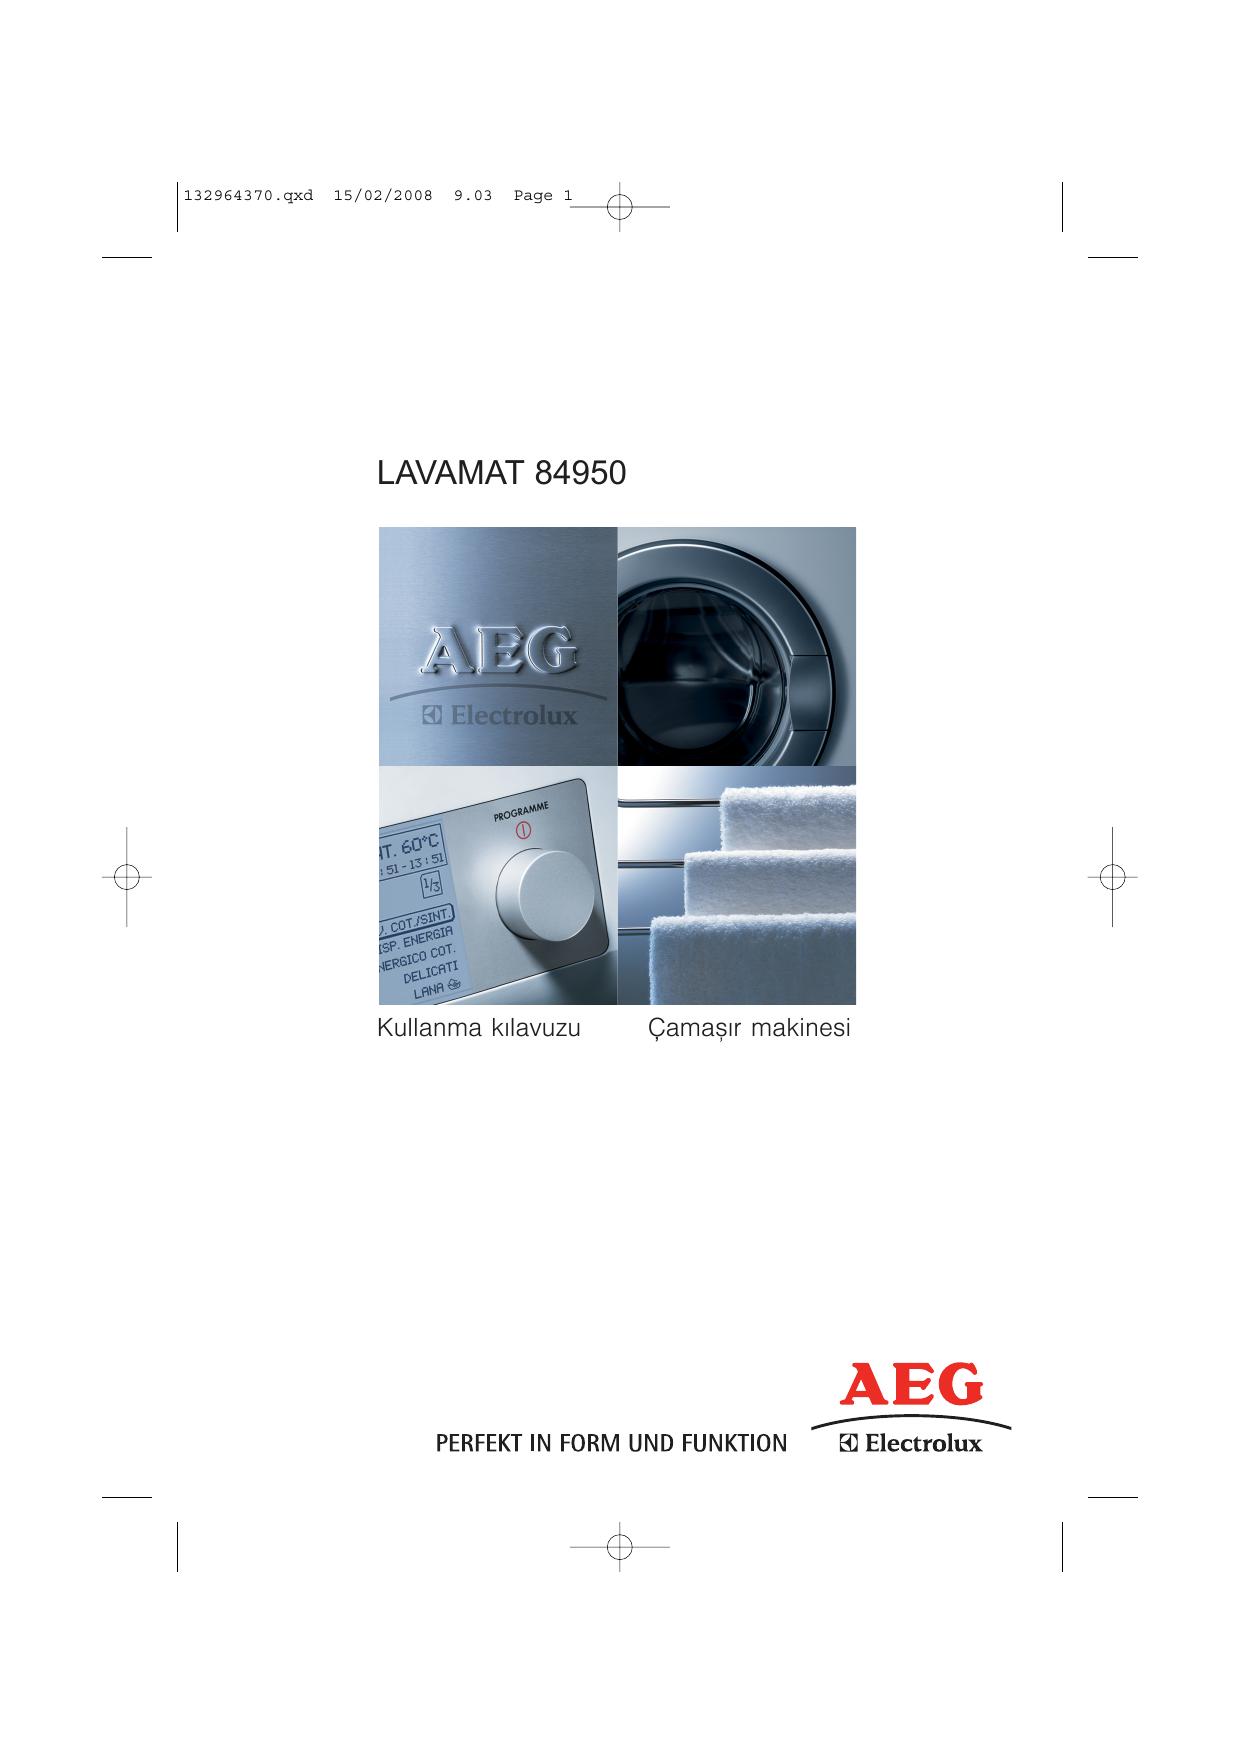 Aeg Electrolux L84950 Kullanim Kilavuzu Manualzz